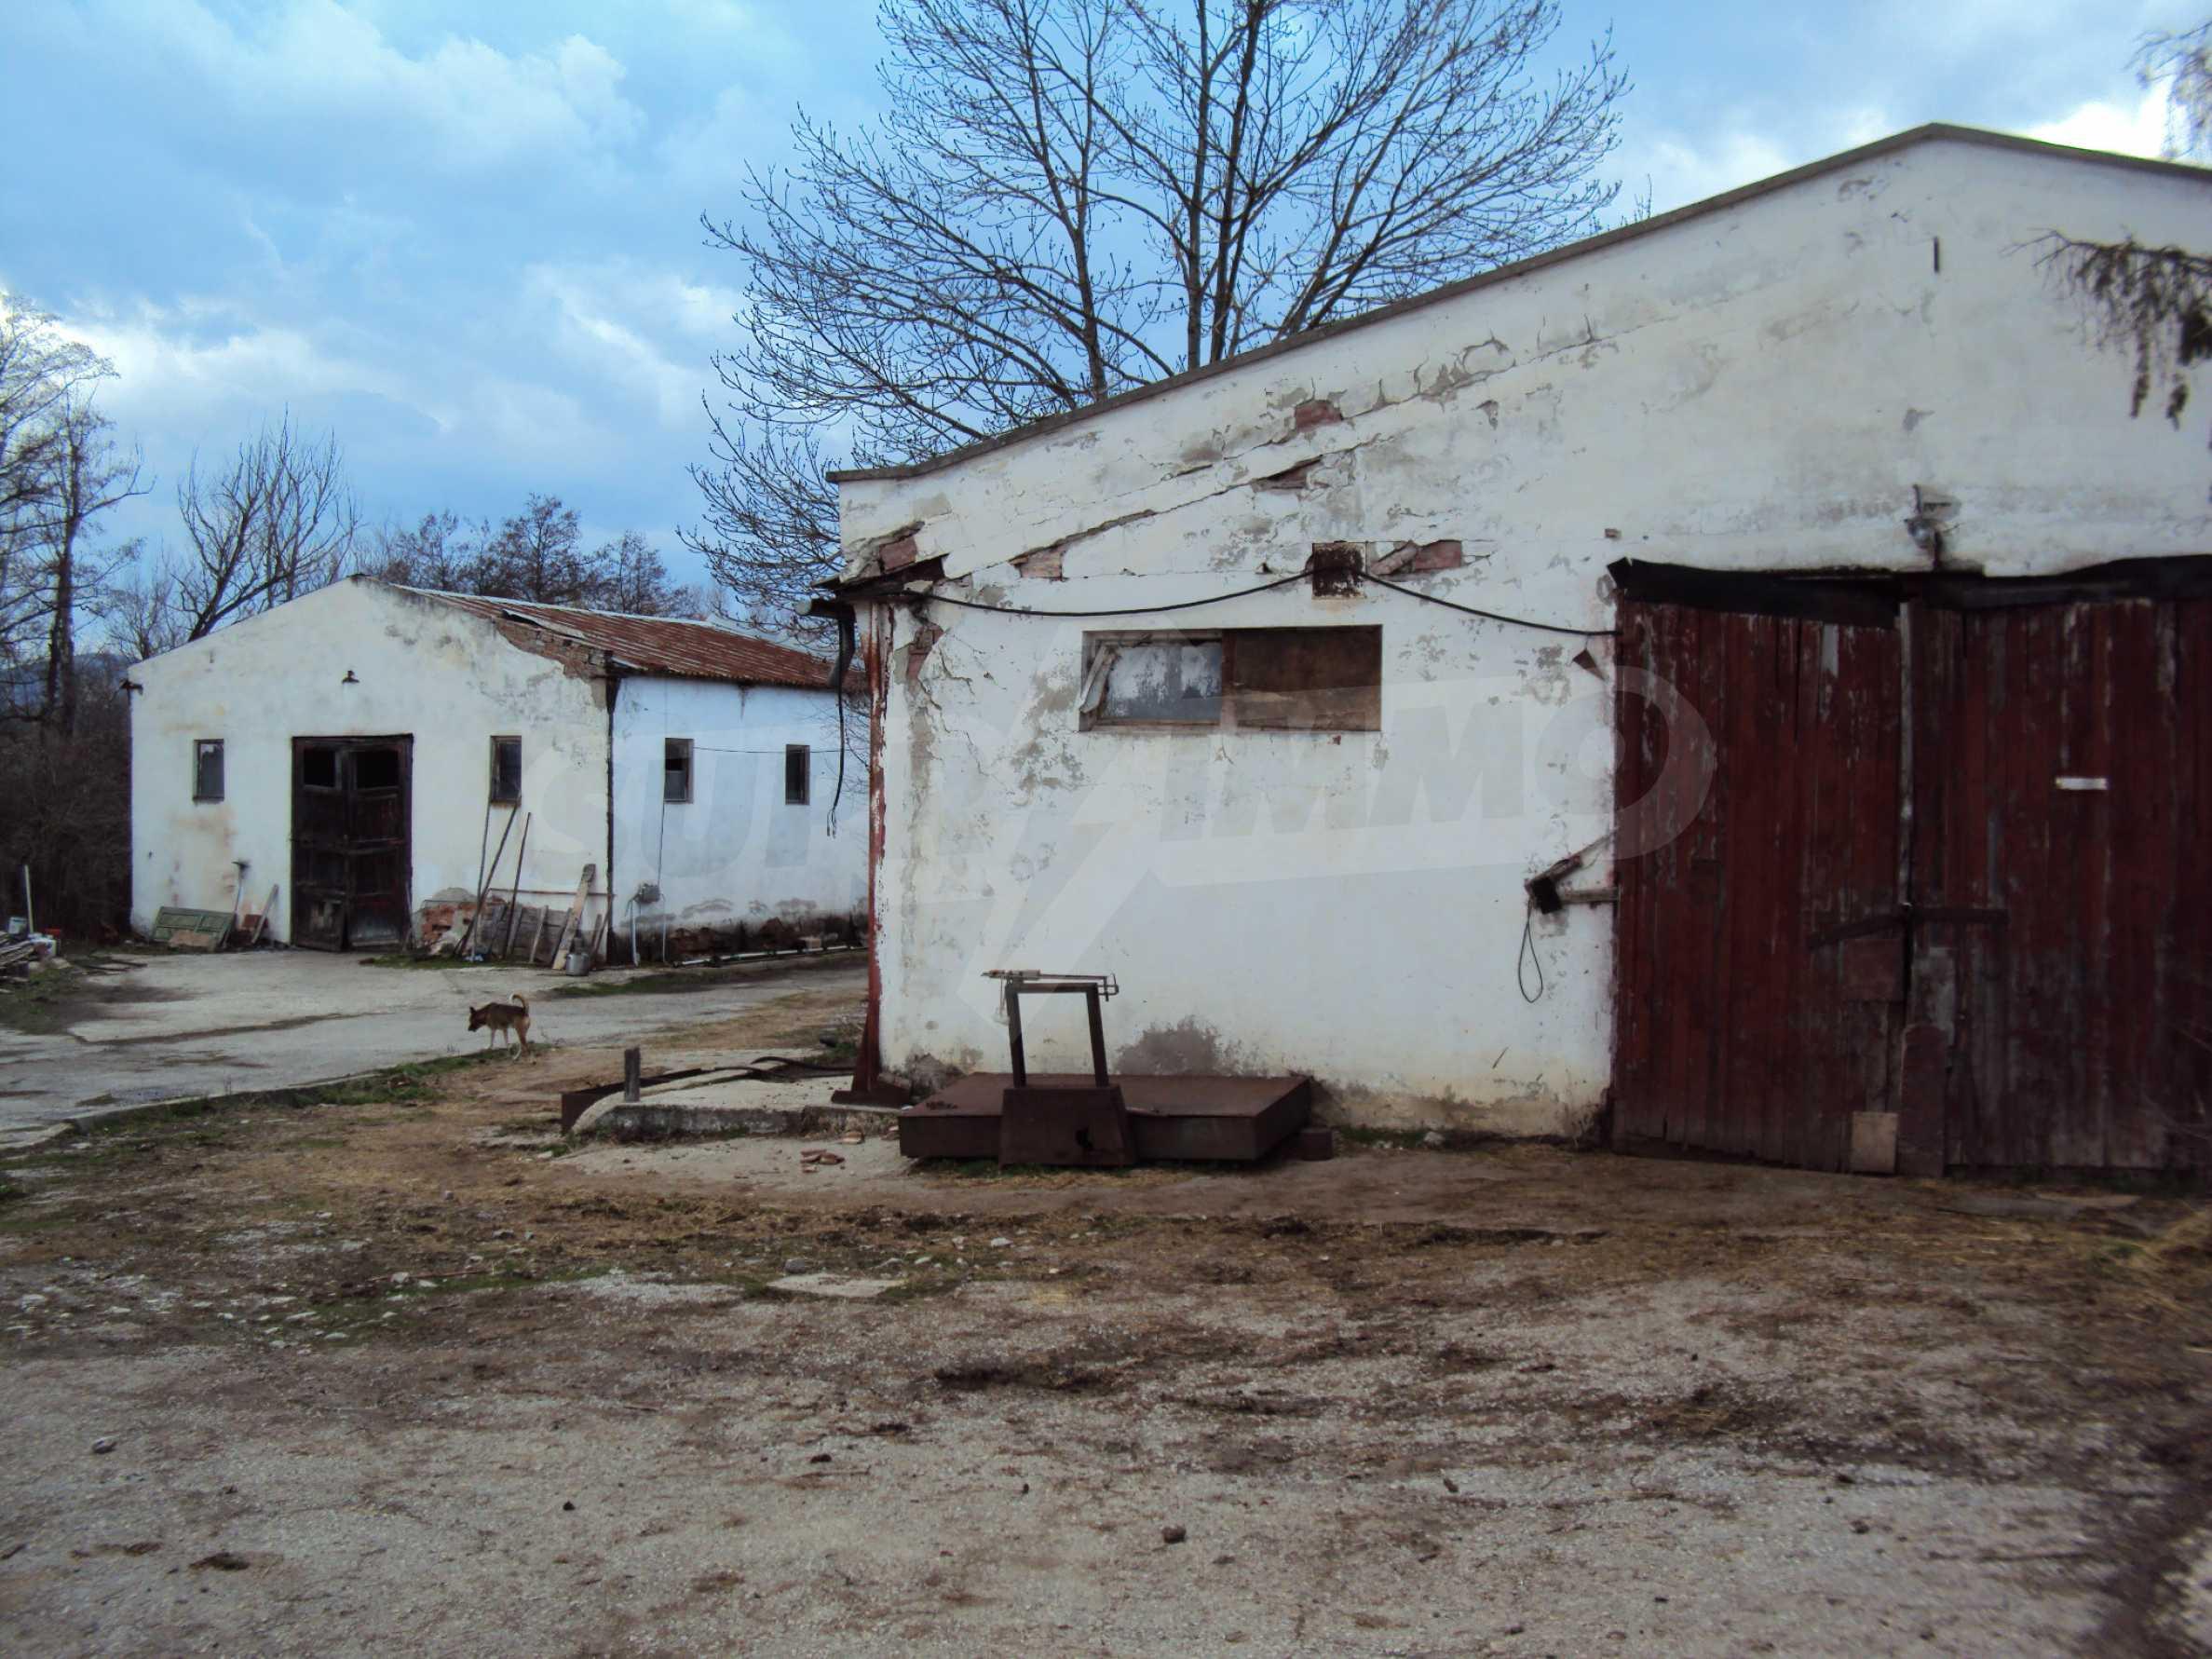 Farm in a small town 24 km from Veliko Tarnovo 11